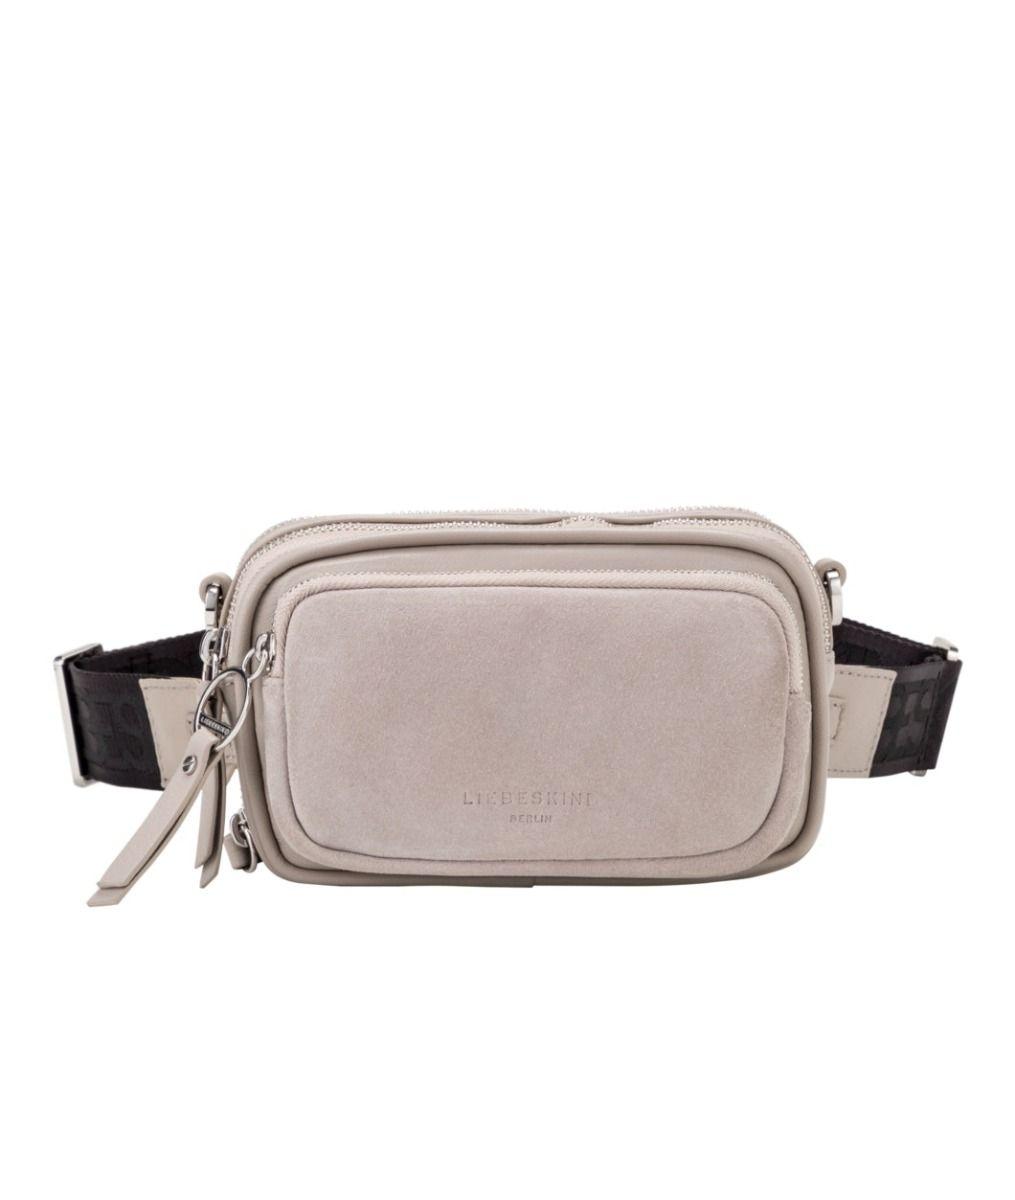 9d30e50fc86ac Taschen - bei ELLA Juwelen im Onlineshop